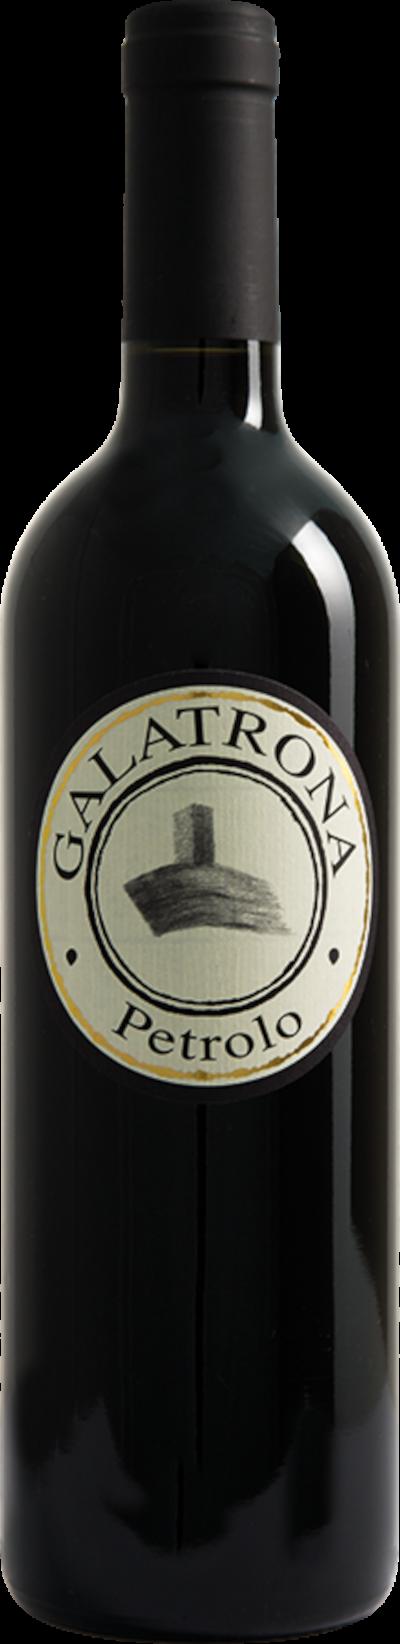 Petrolo - Galatrona Val d'Arno di Sopra DOC